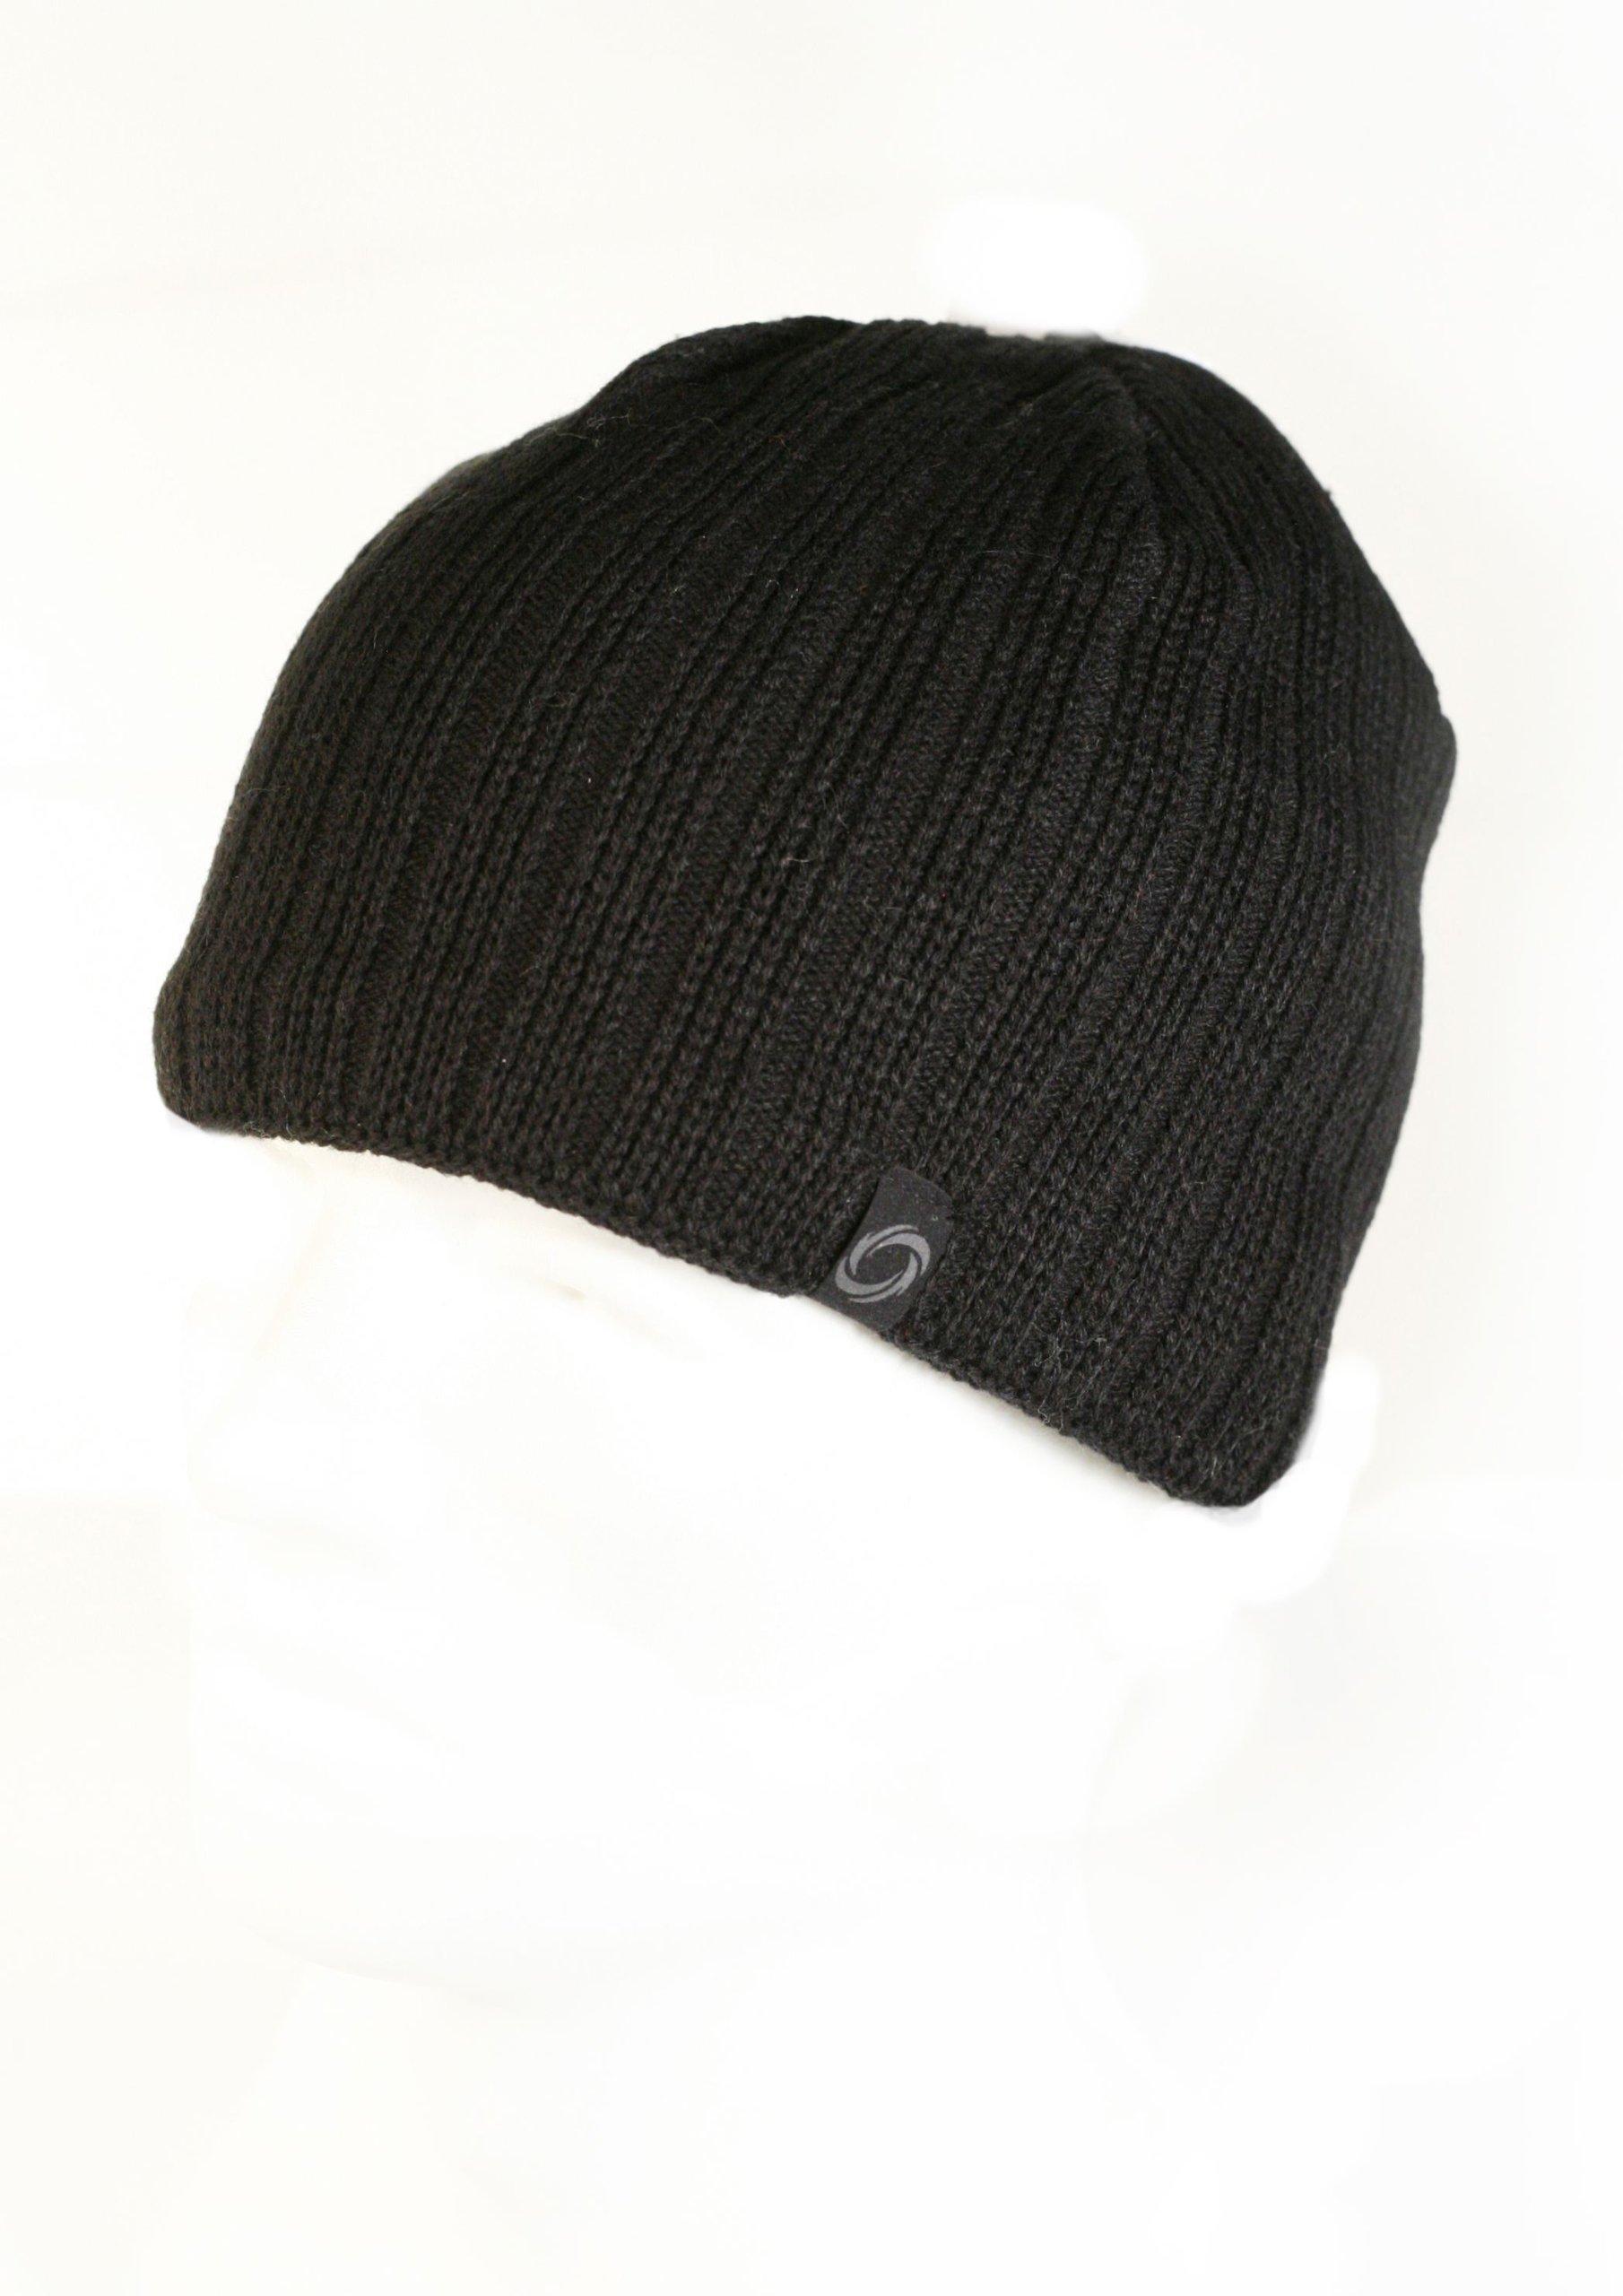 Chaos Hats Men's Technician Fine Gauge Beanie (Black, One Size)